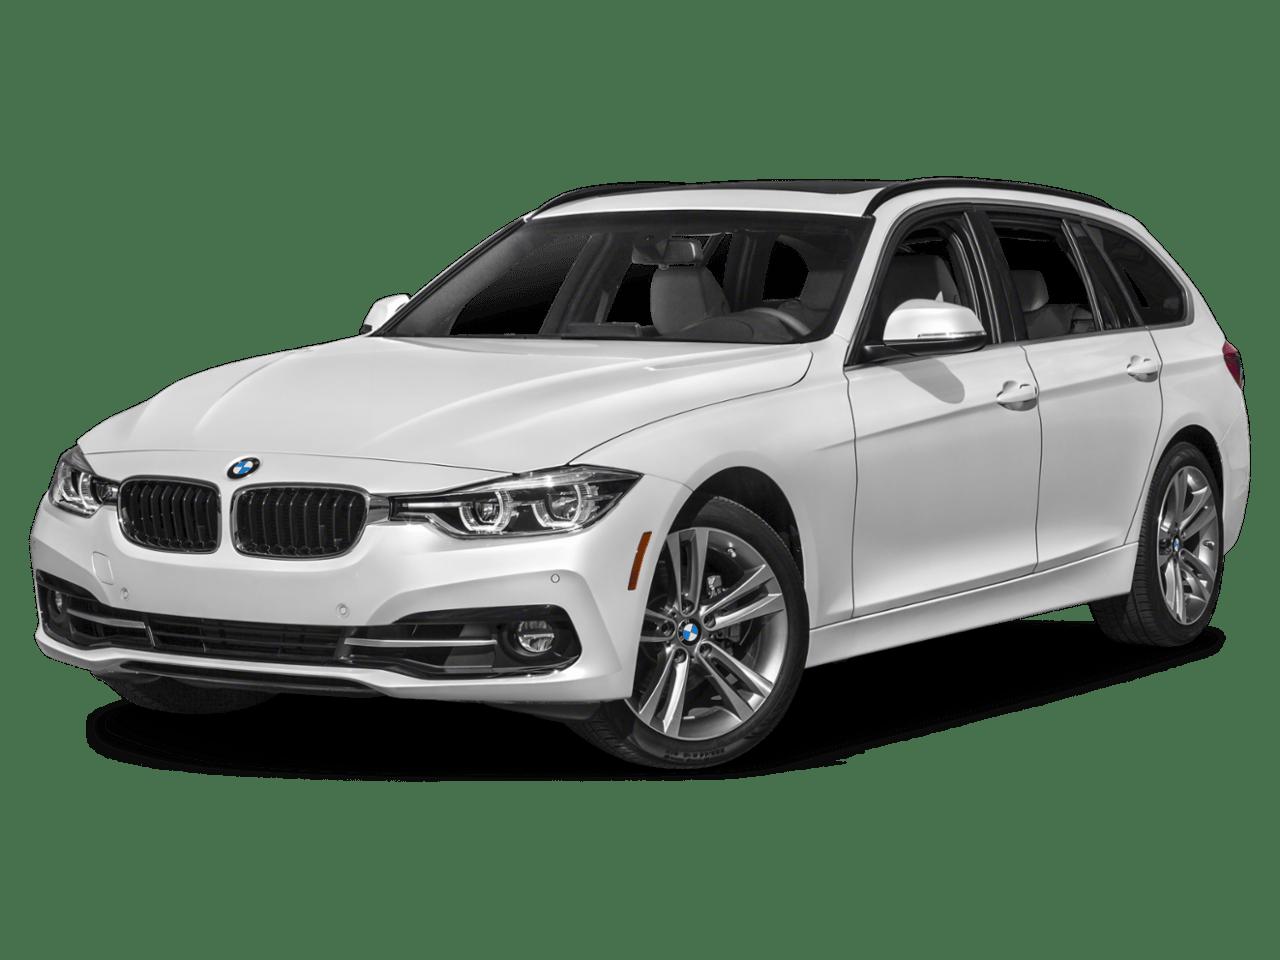 2019 Bmw 3 Series Touring Birchwood Automotive Group